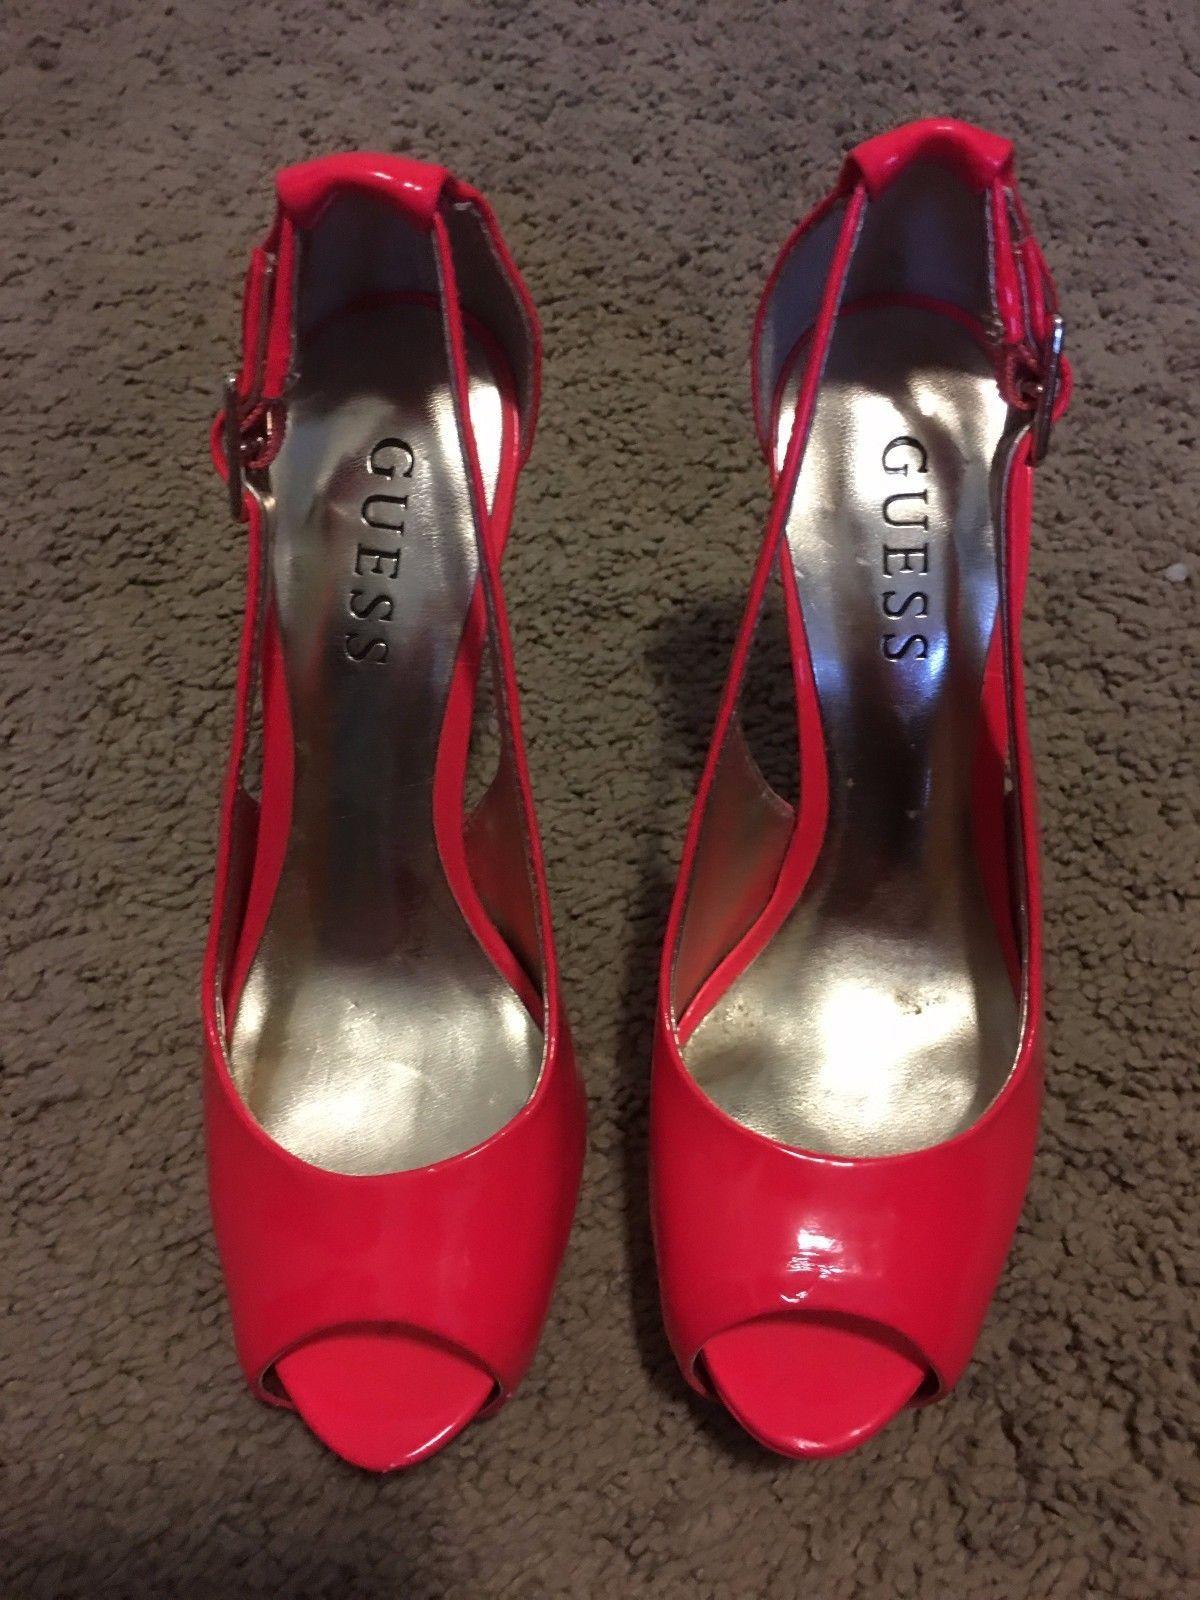 Guess Damens Schuhes Neon Pink Peep Toe Platform Heel Heel Heel Größe 5   Designer c4e214